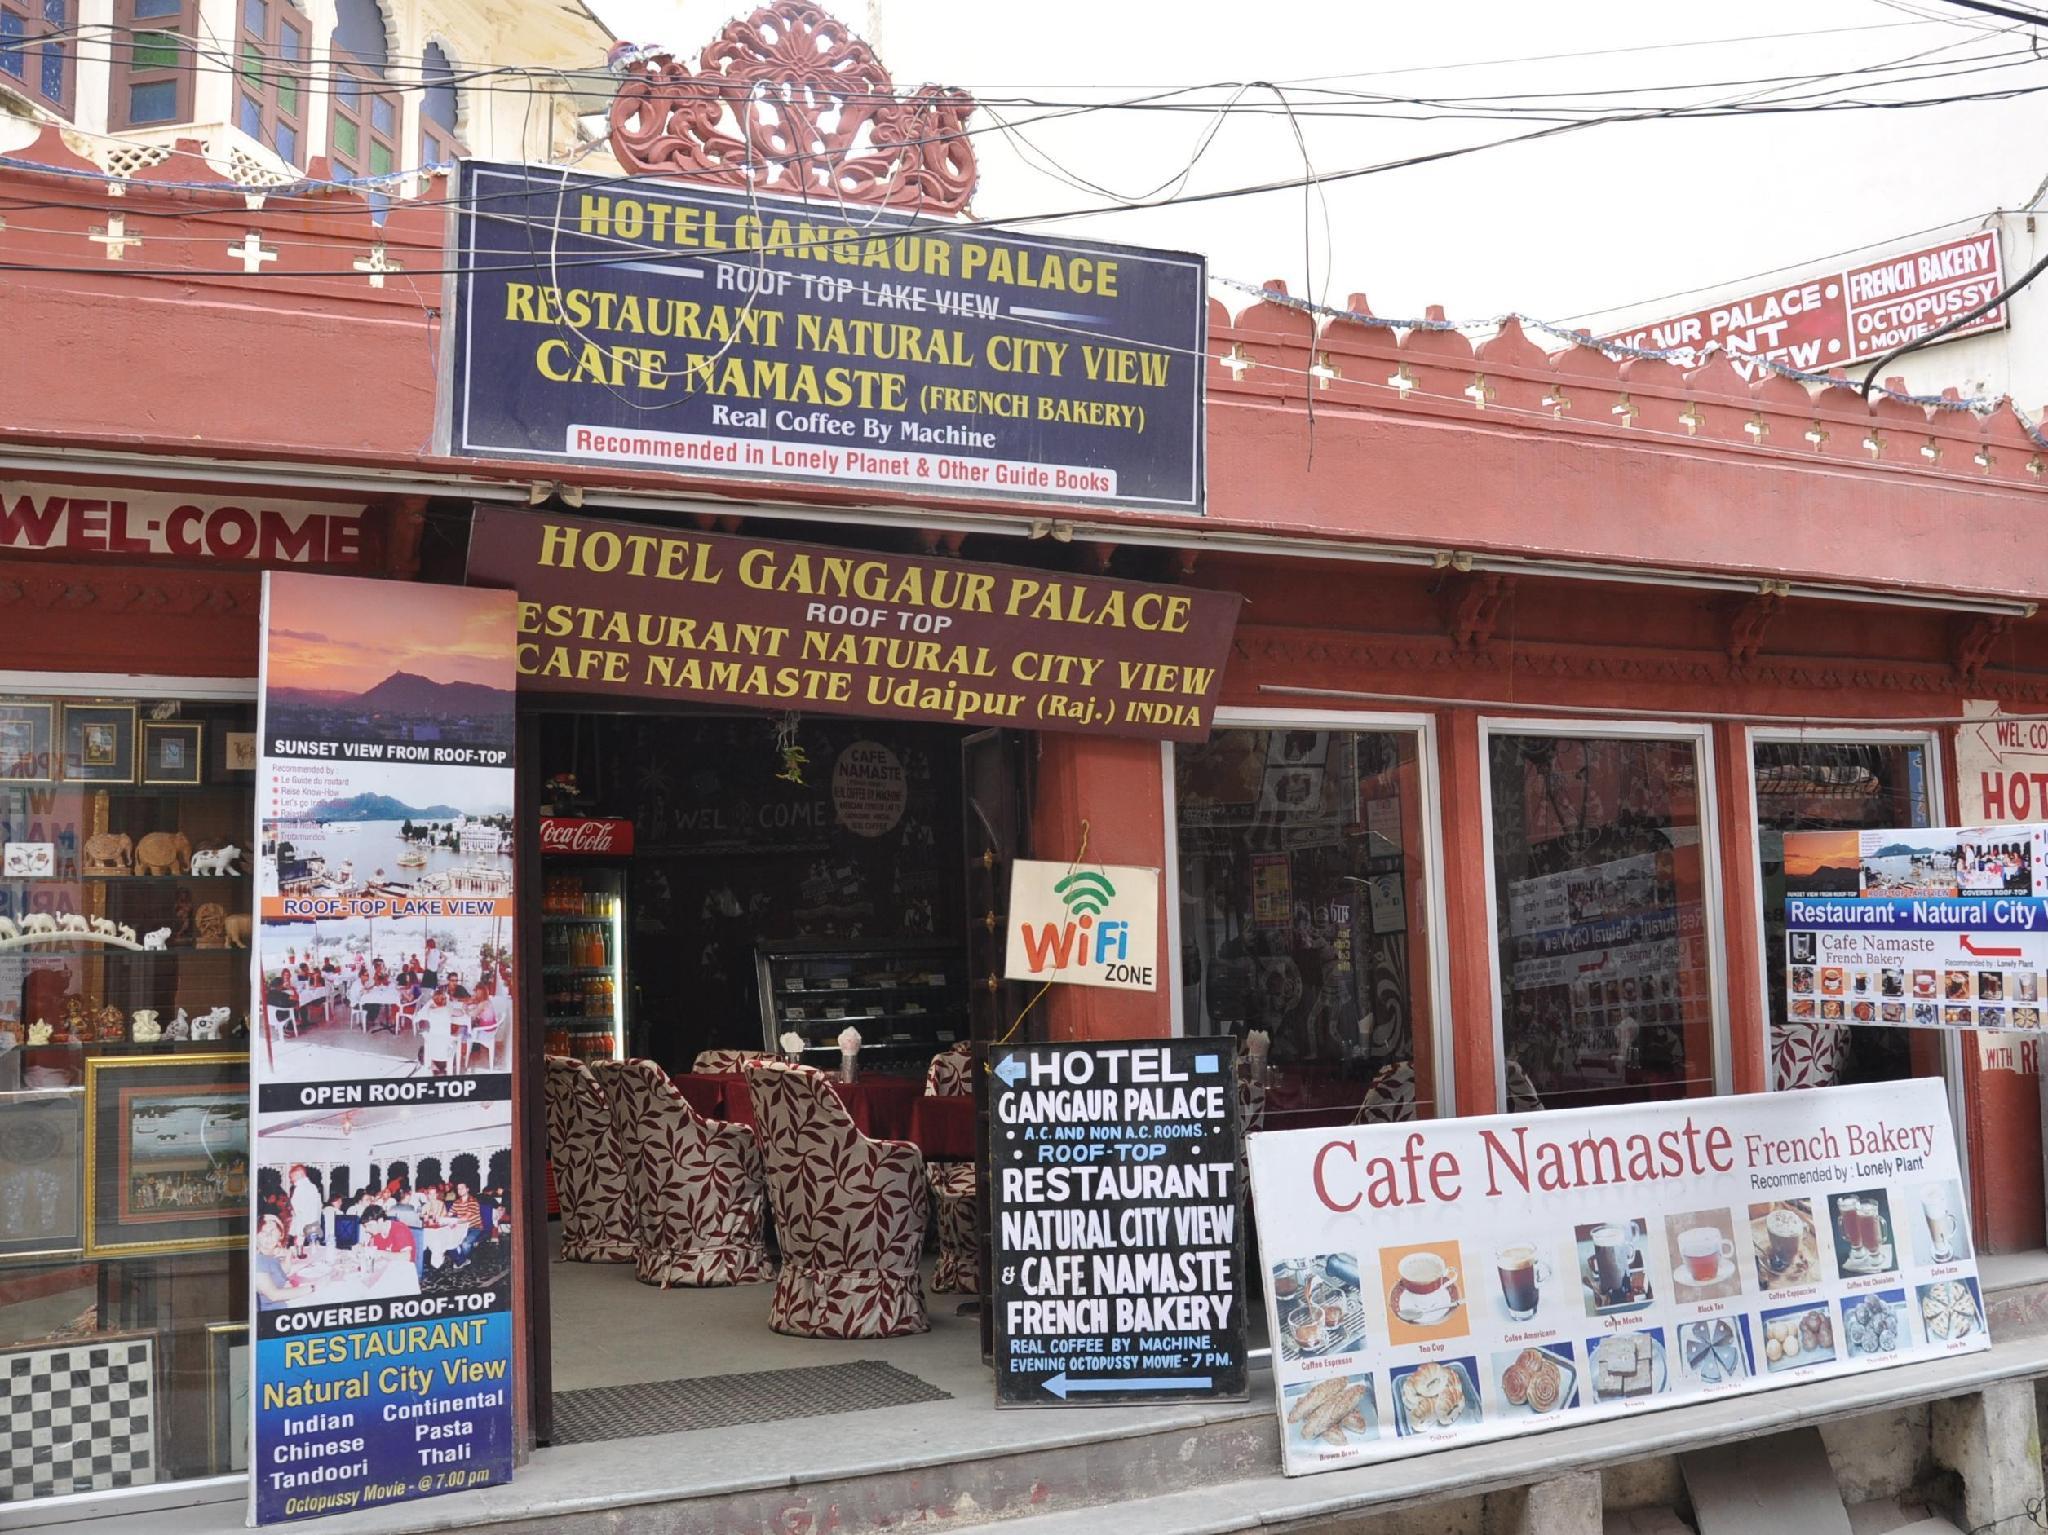 Hotel Gangaur Palace